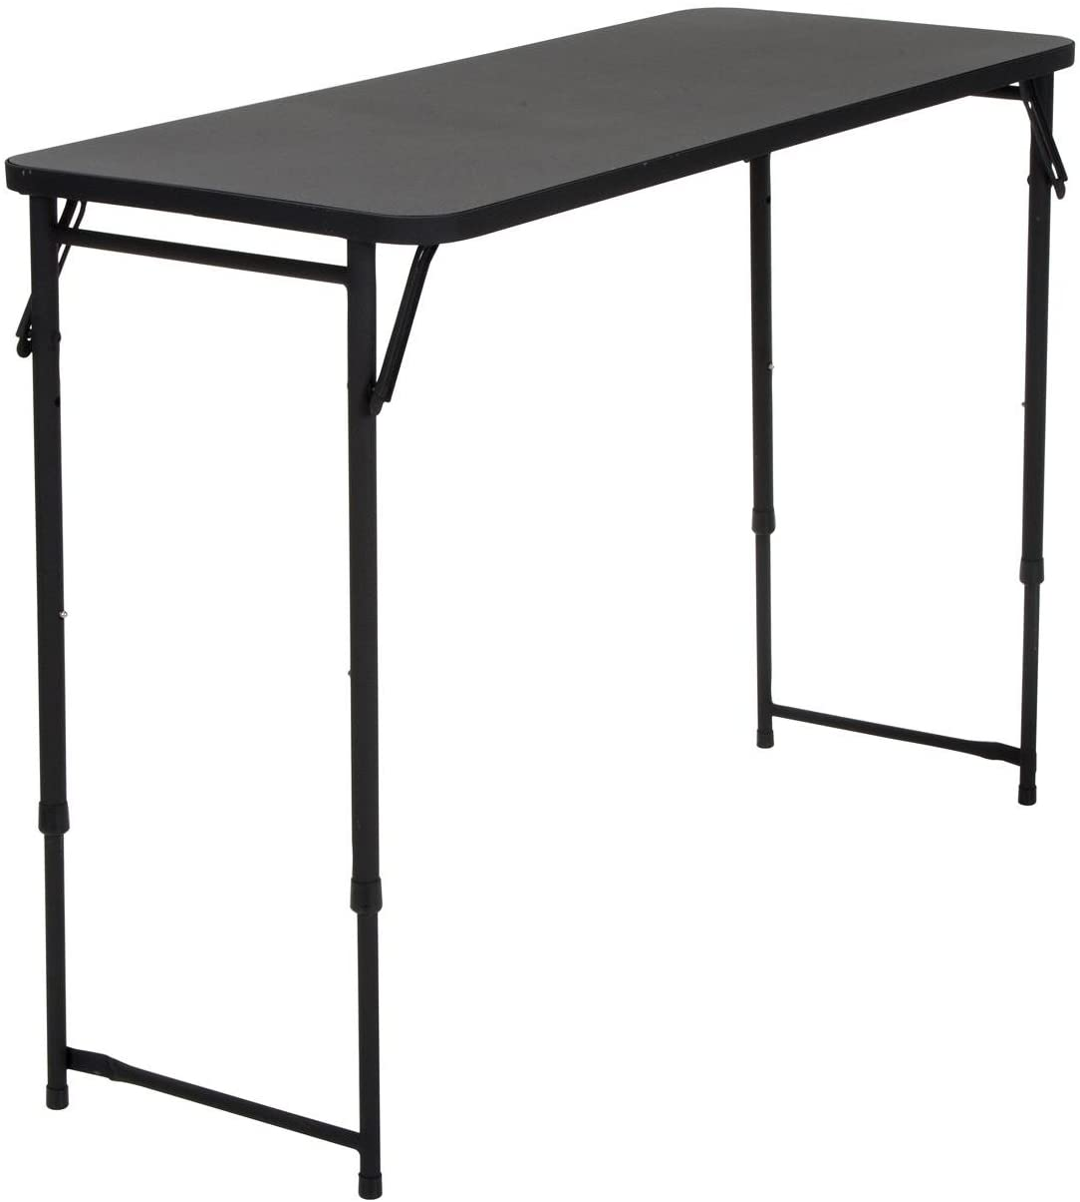 "COSCO 20"" x 48"" Adjustable Height PVC Top Table, Black"